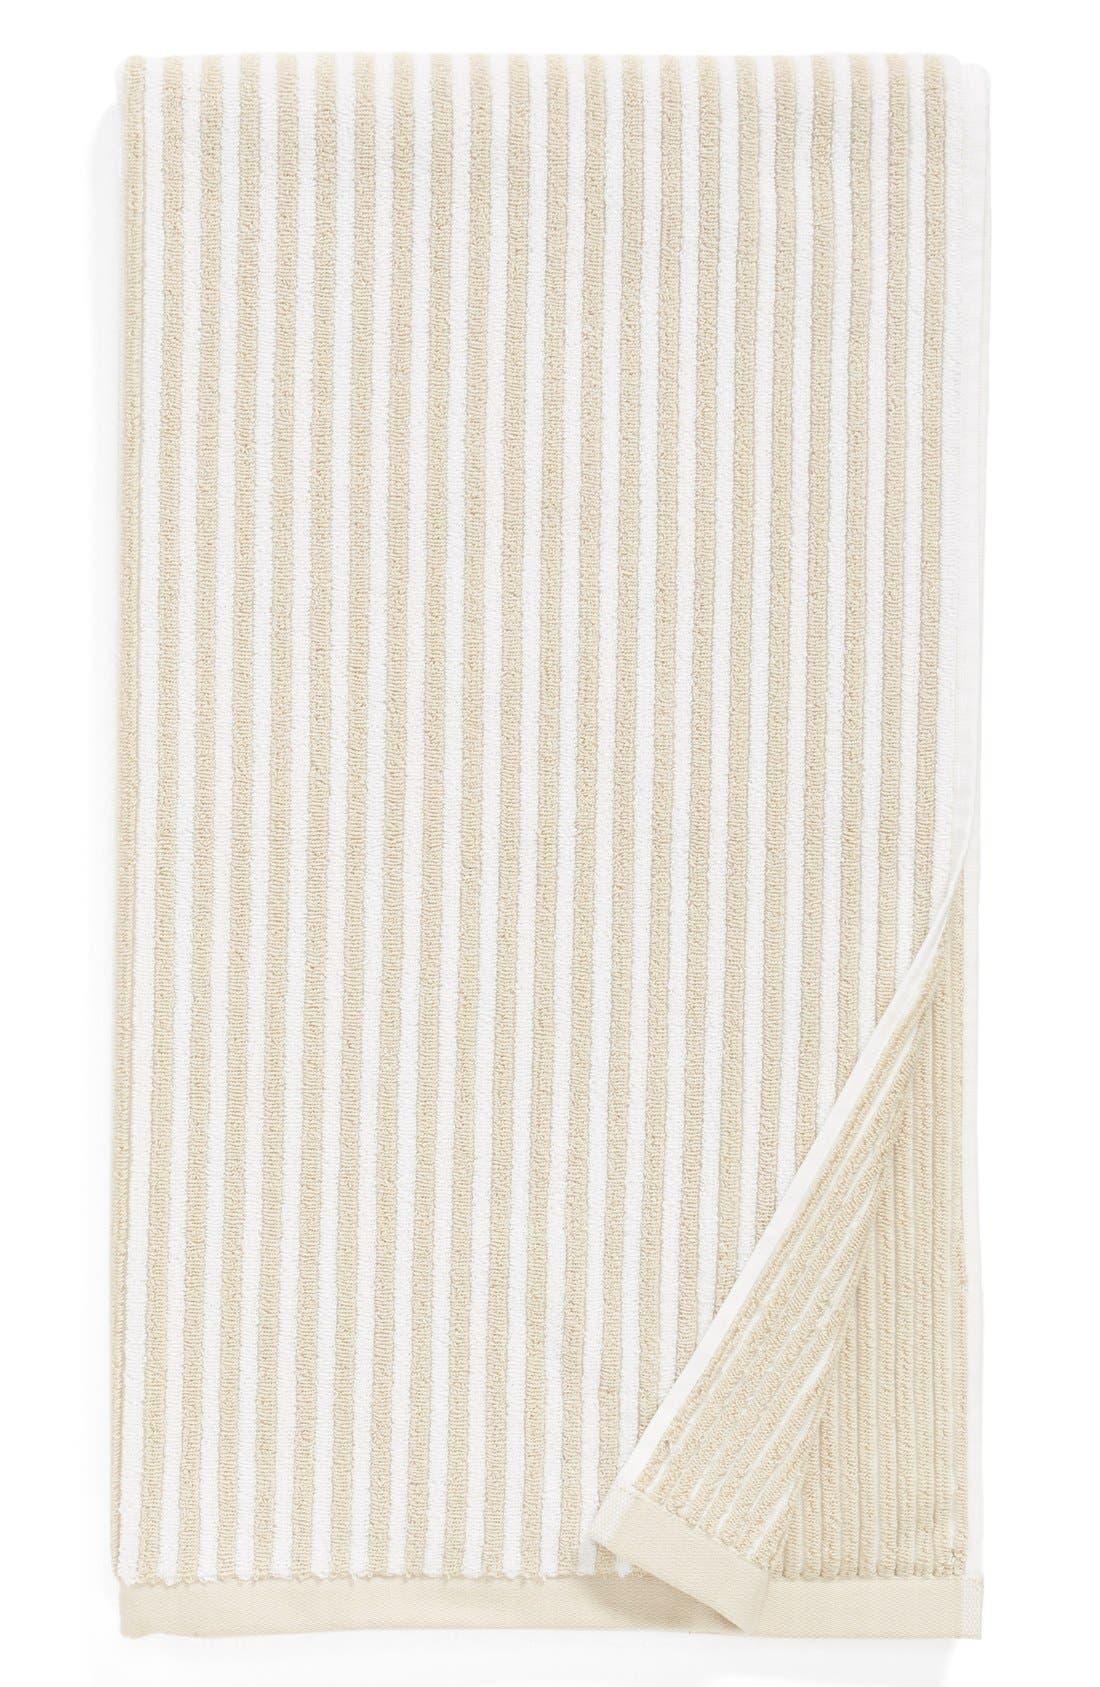 Main Image - Nordstrom at Home 'Stria' Bath Towel